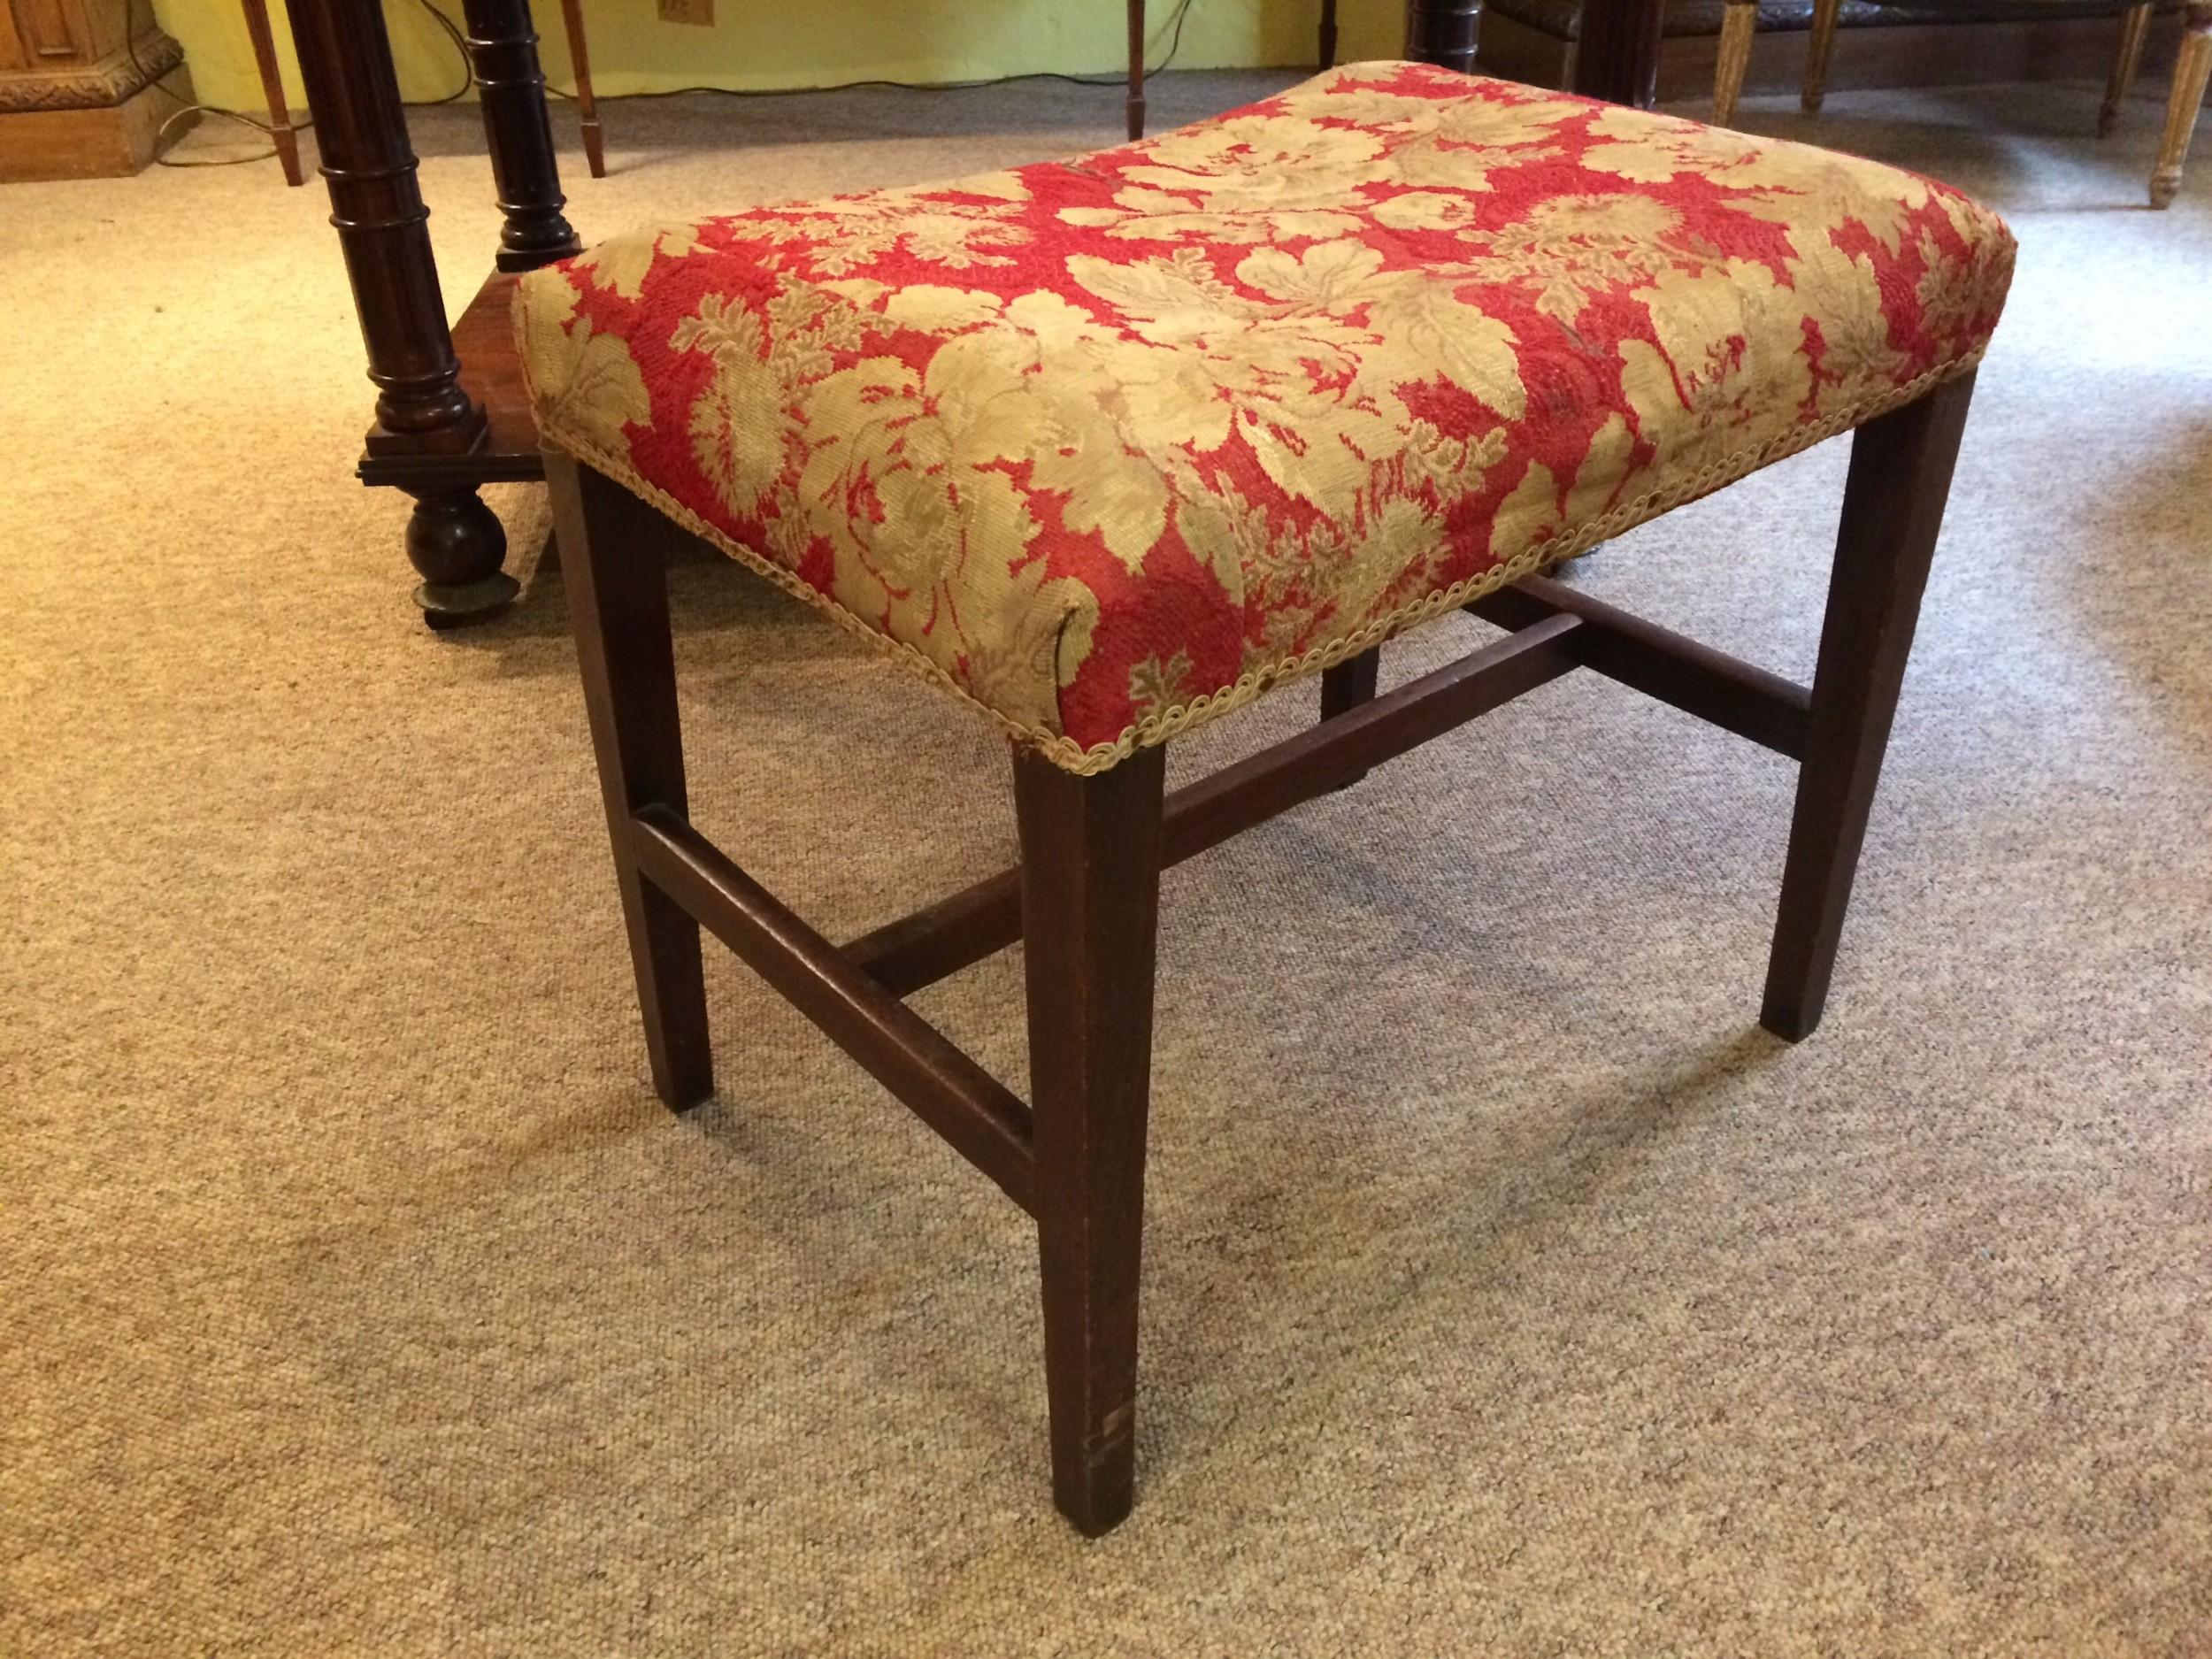 18thc mahogany stool with petit point tapestry